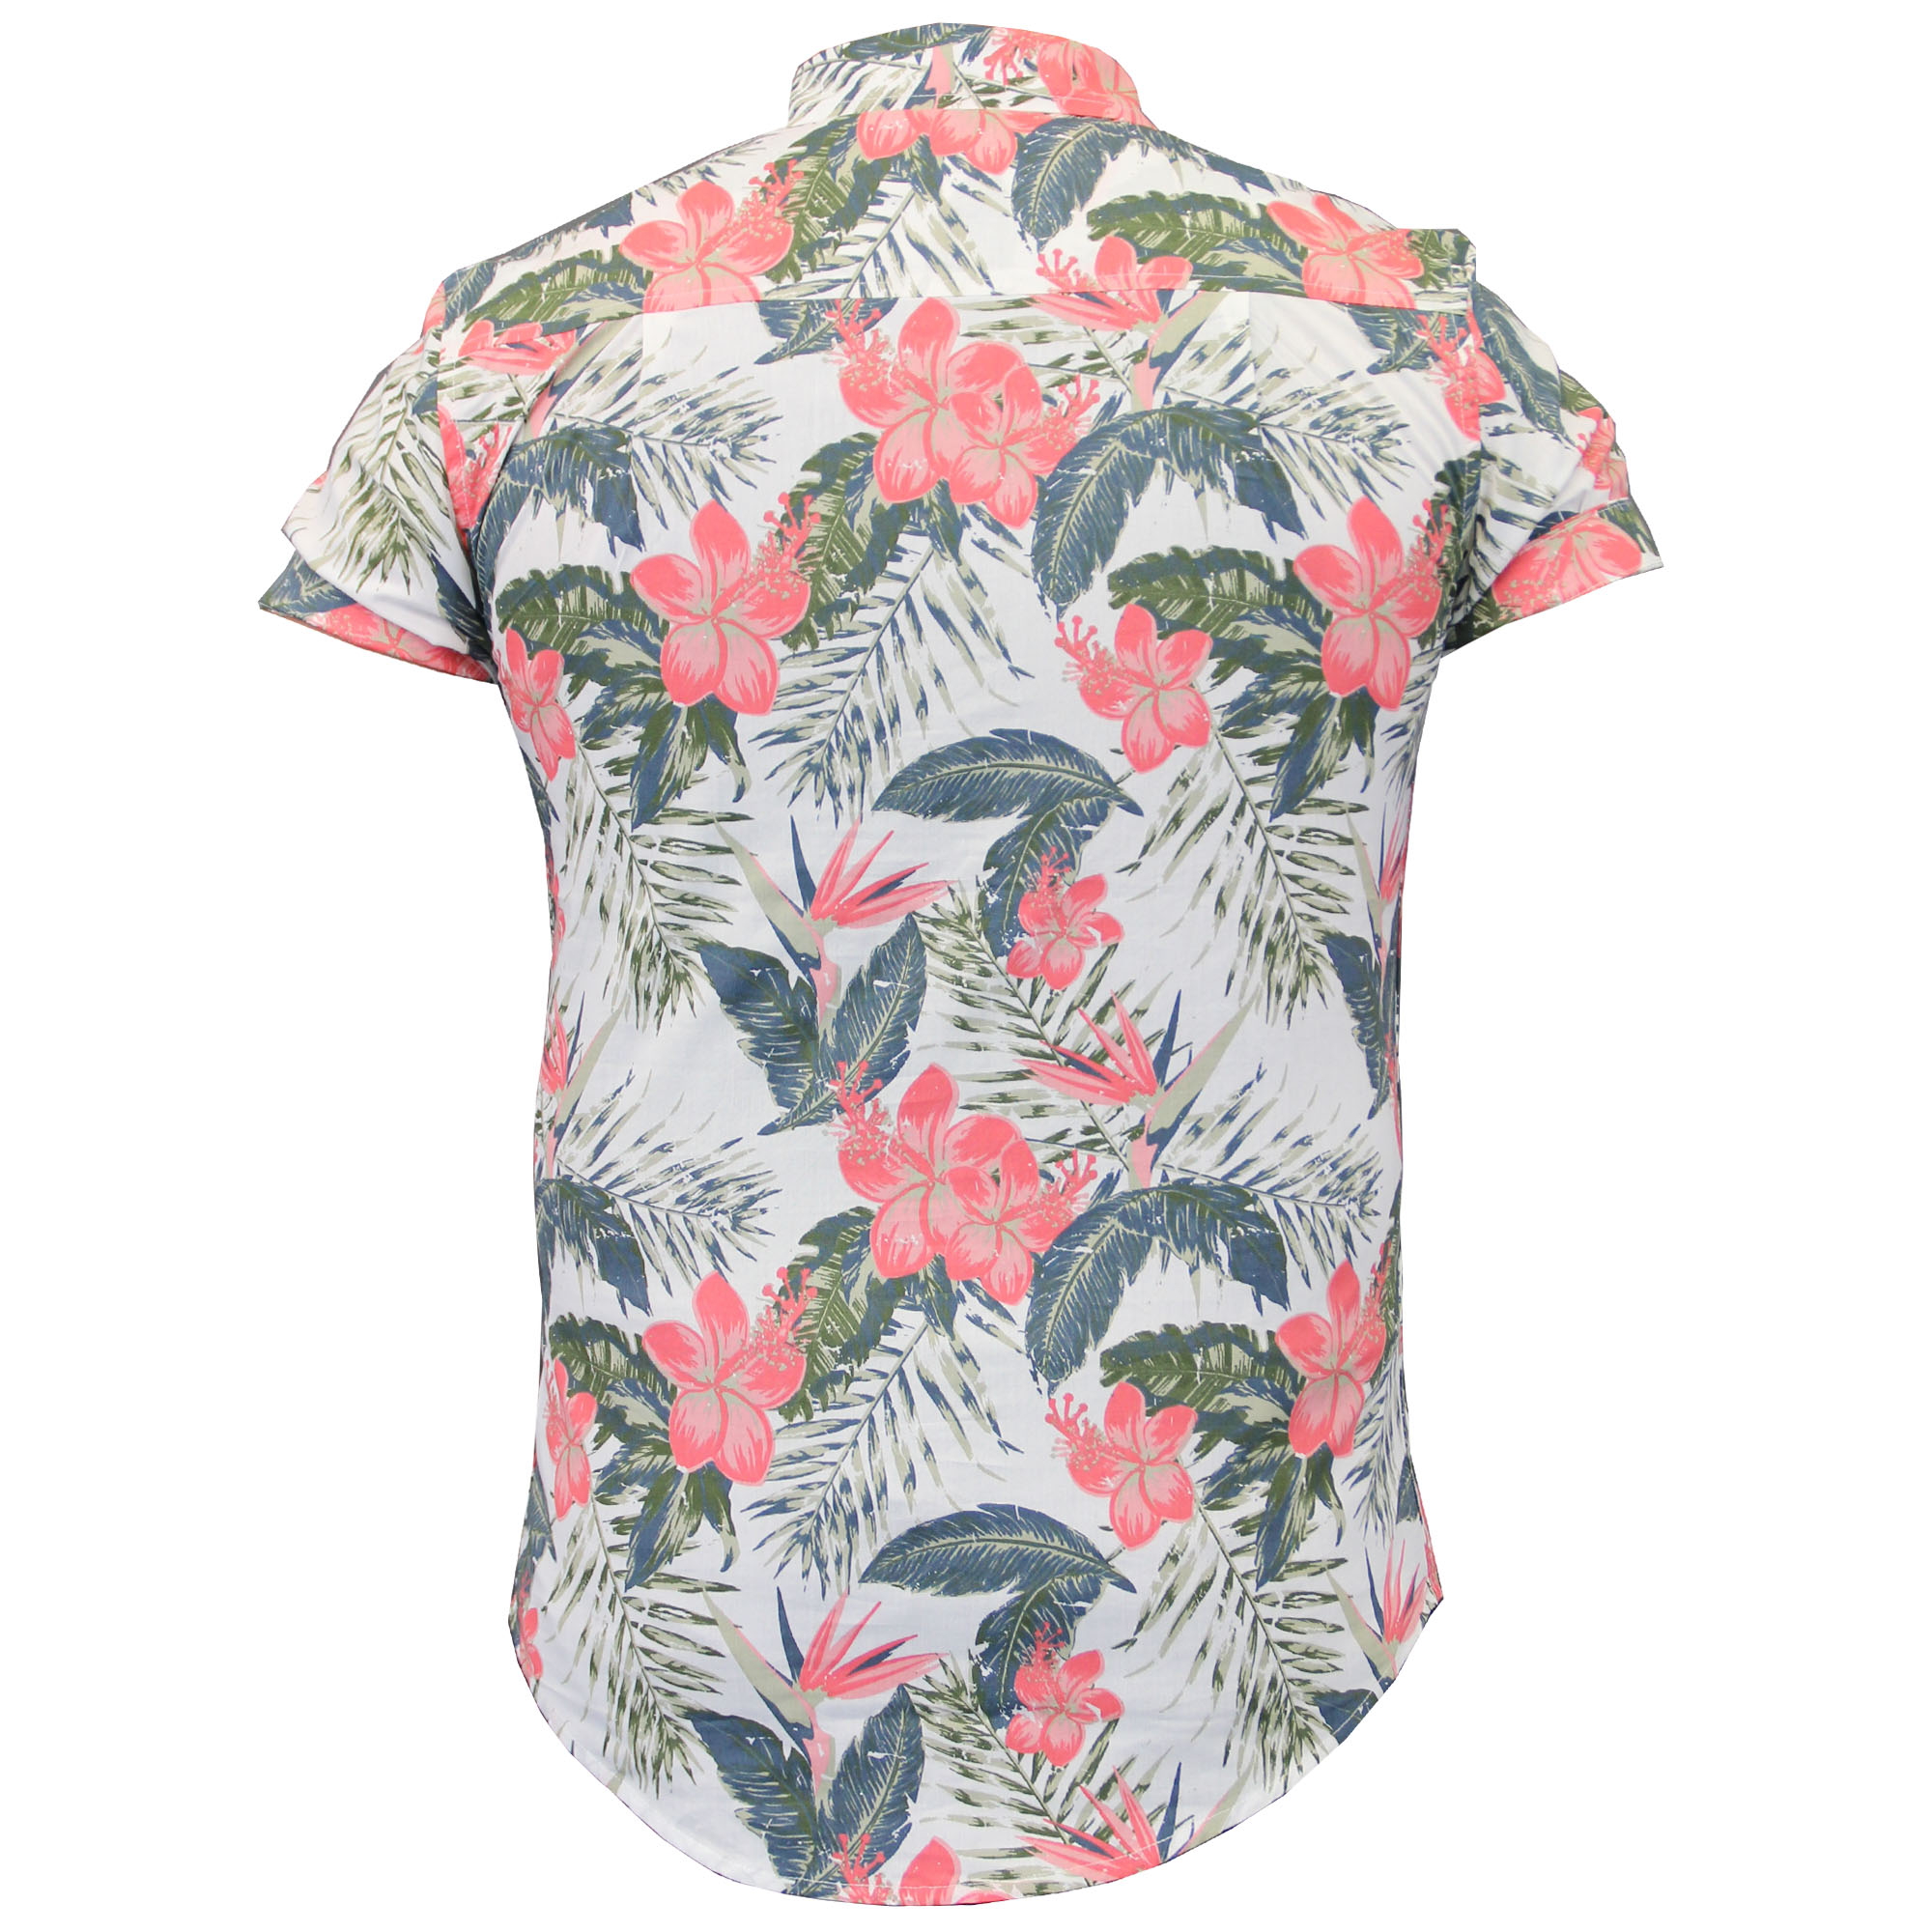 7b756d8f0 Para Hombre camisas hawaianas few Estampado Floral Chambray Manga